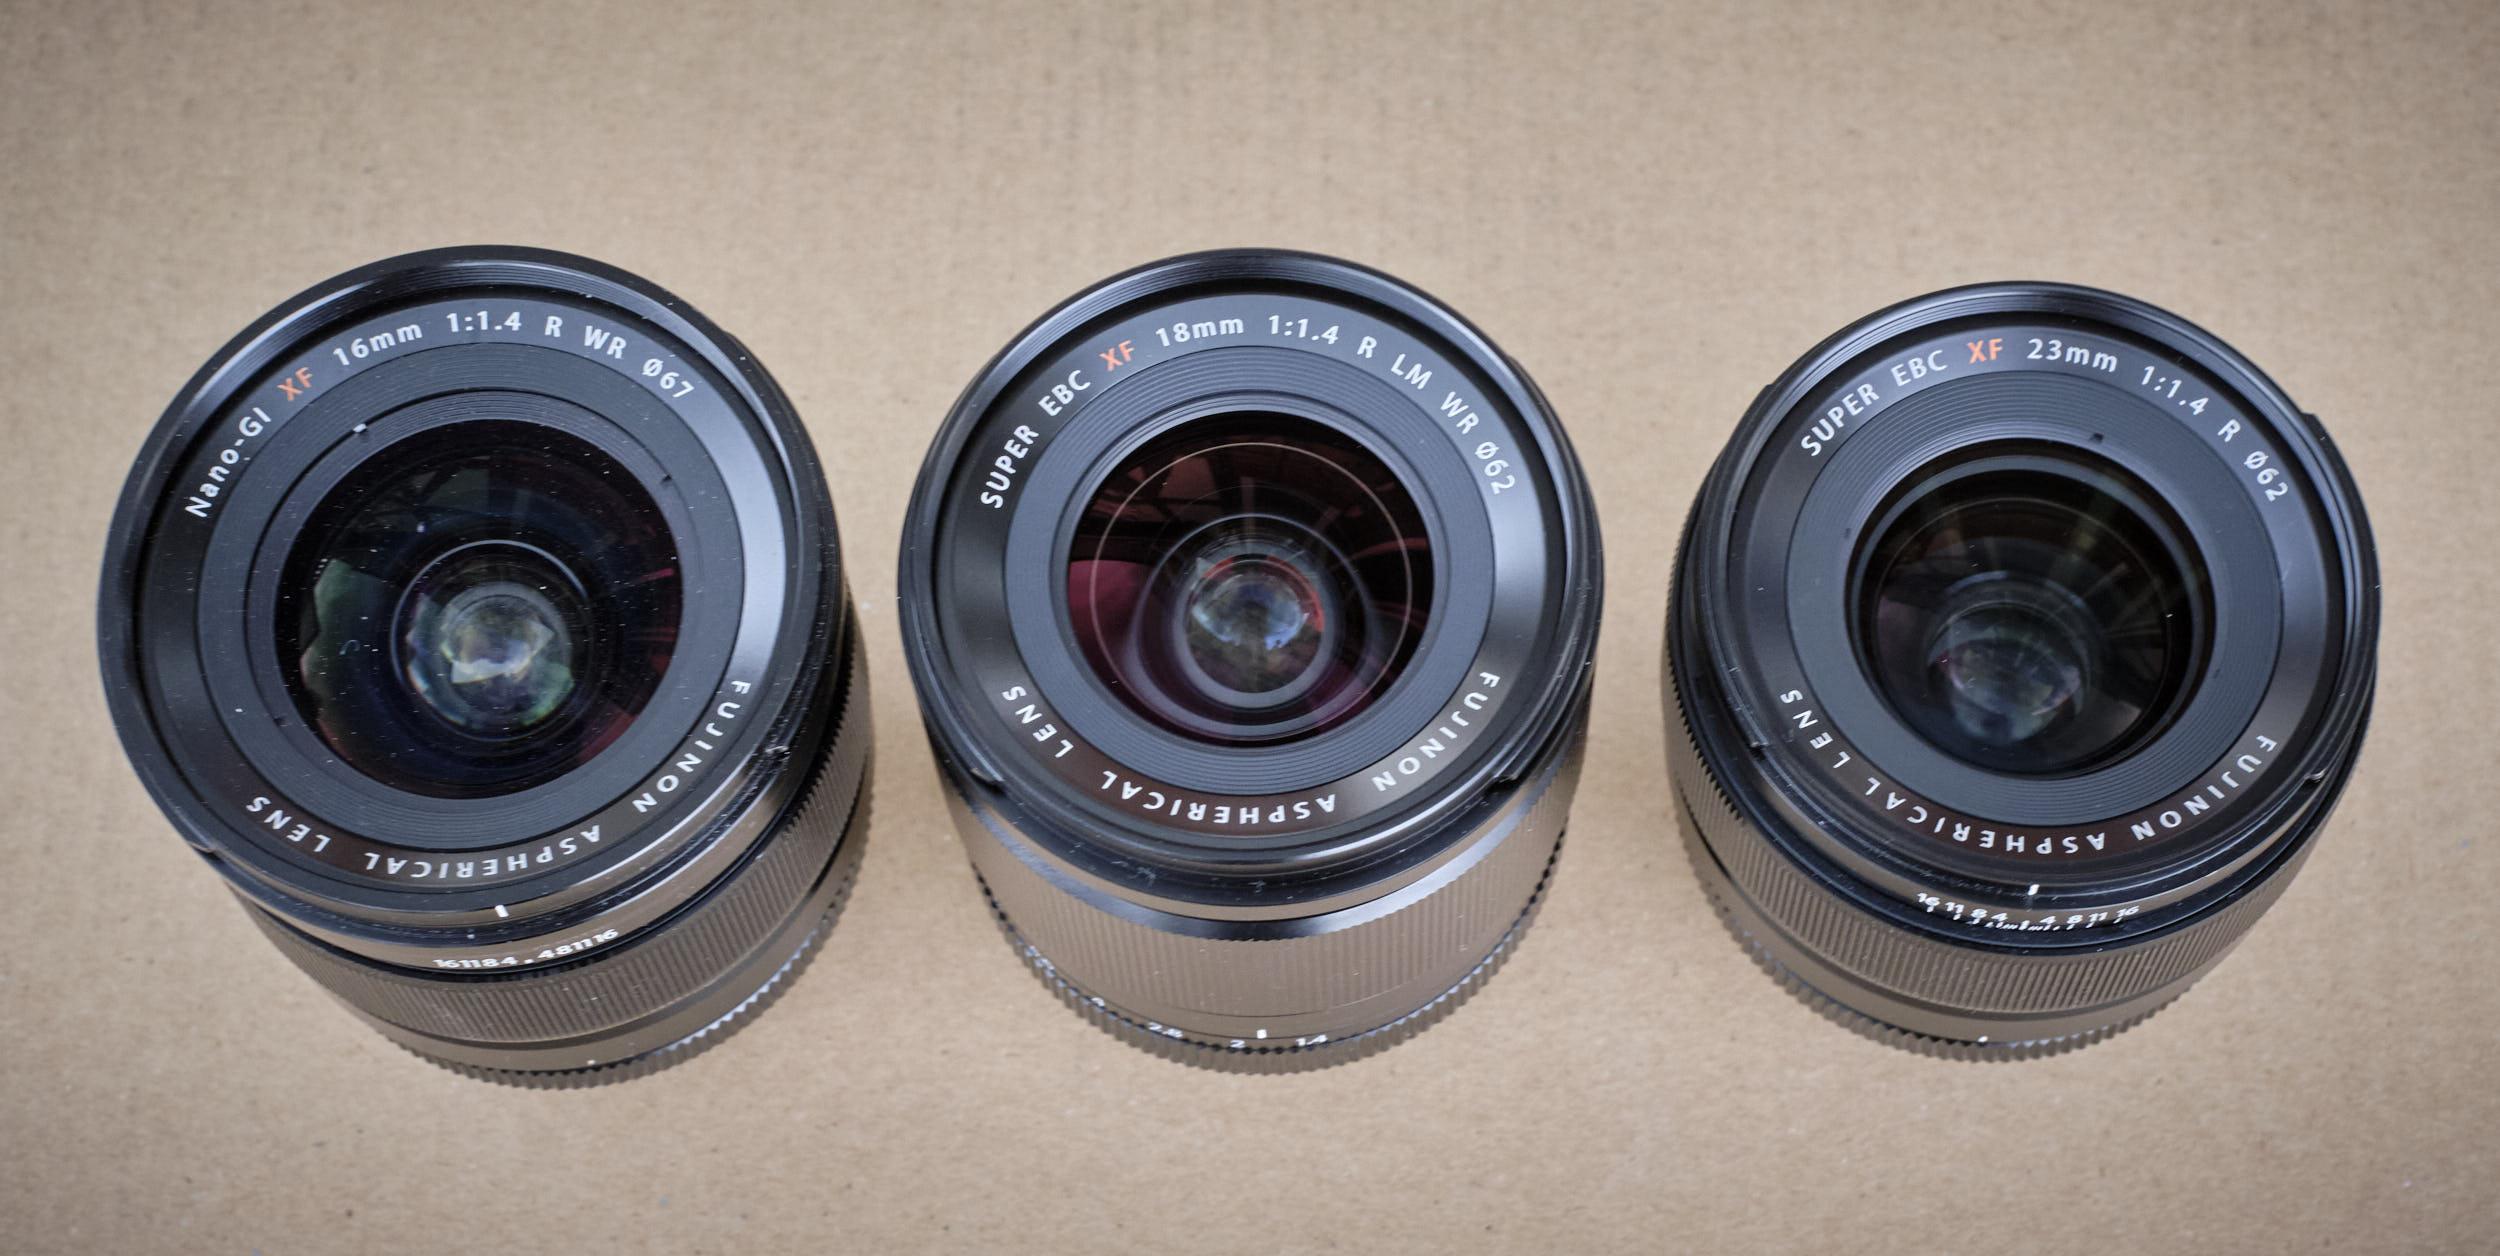 Größenvergleich Fujinon XF18mm/f1.4, Fujinon XF23mm/f1.4 und Fujinon XF16mm/f1.4